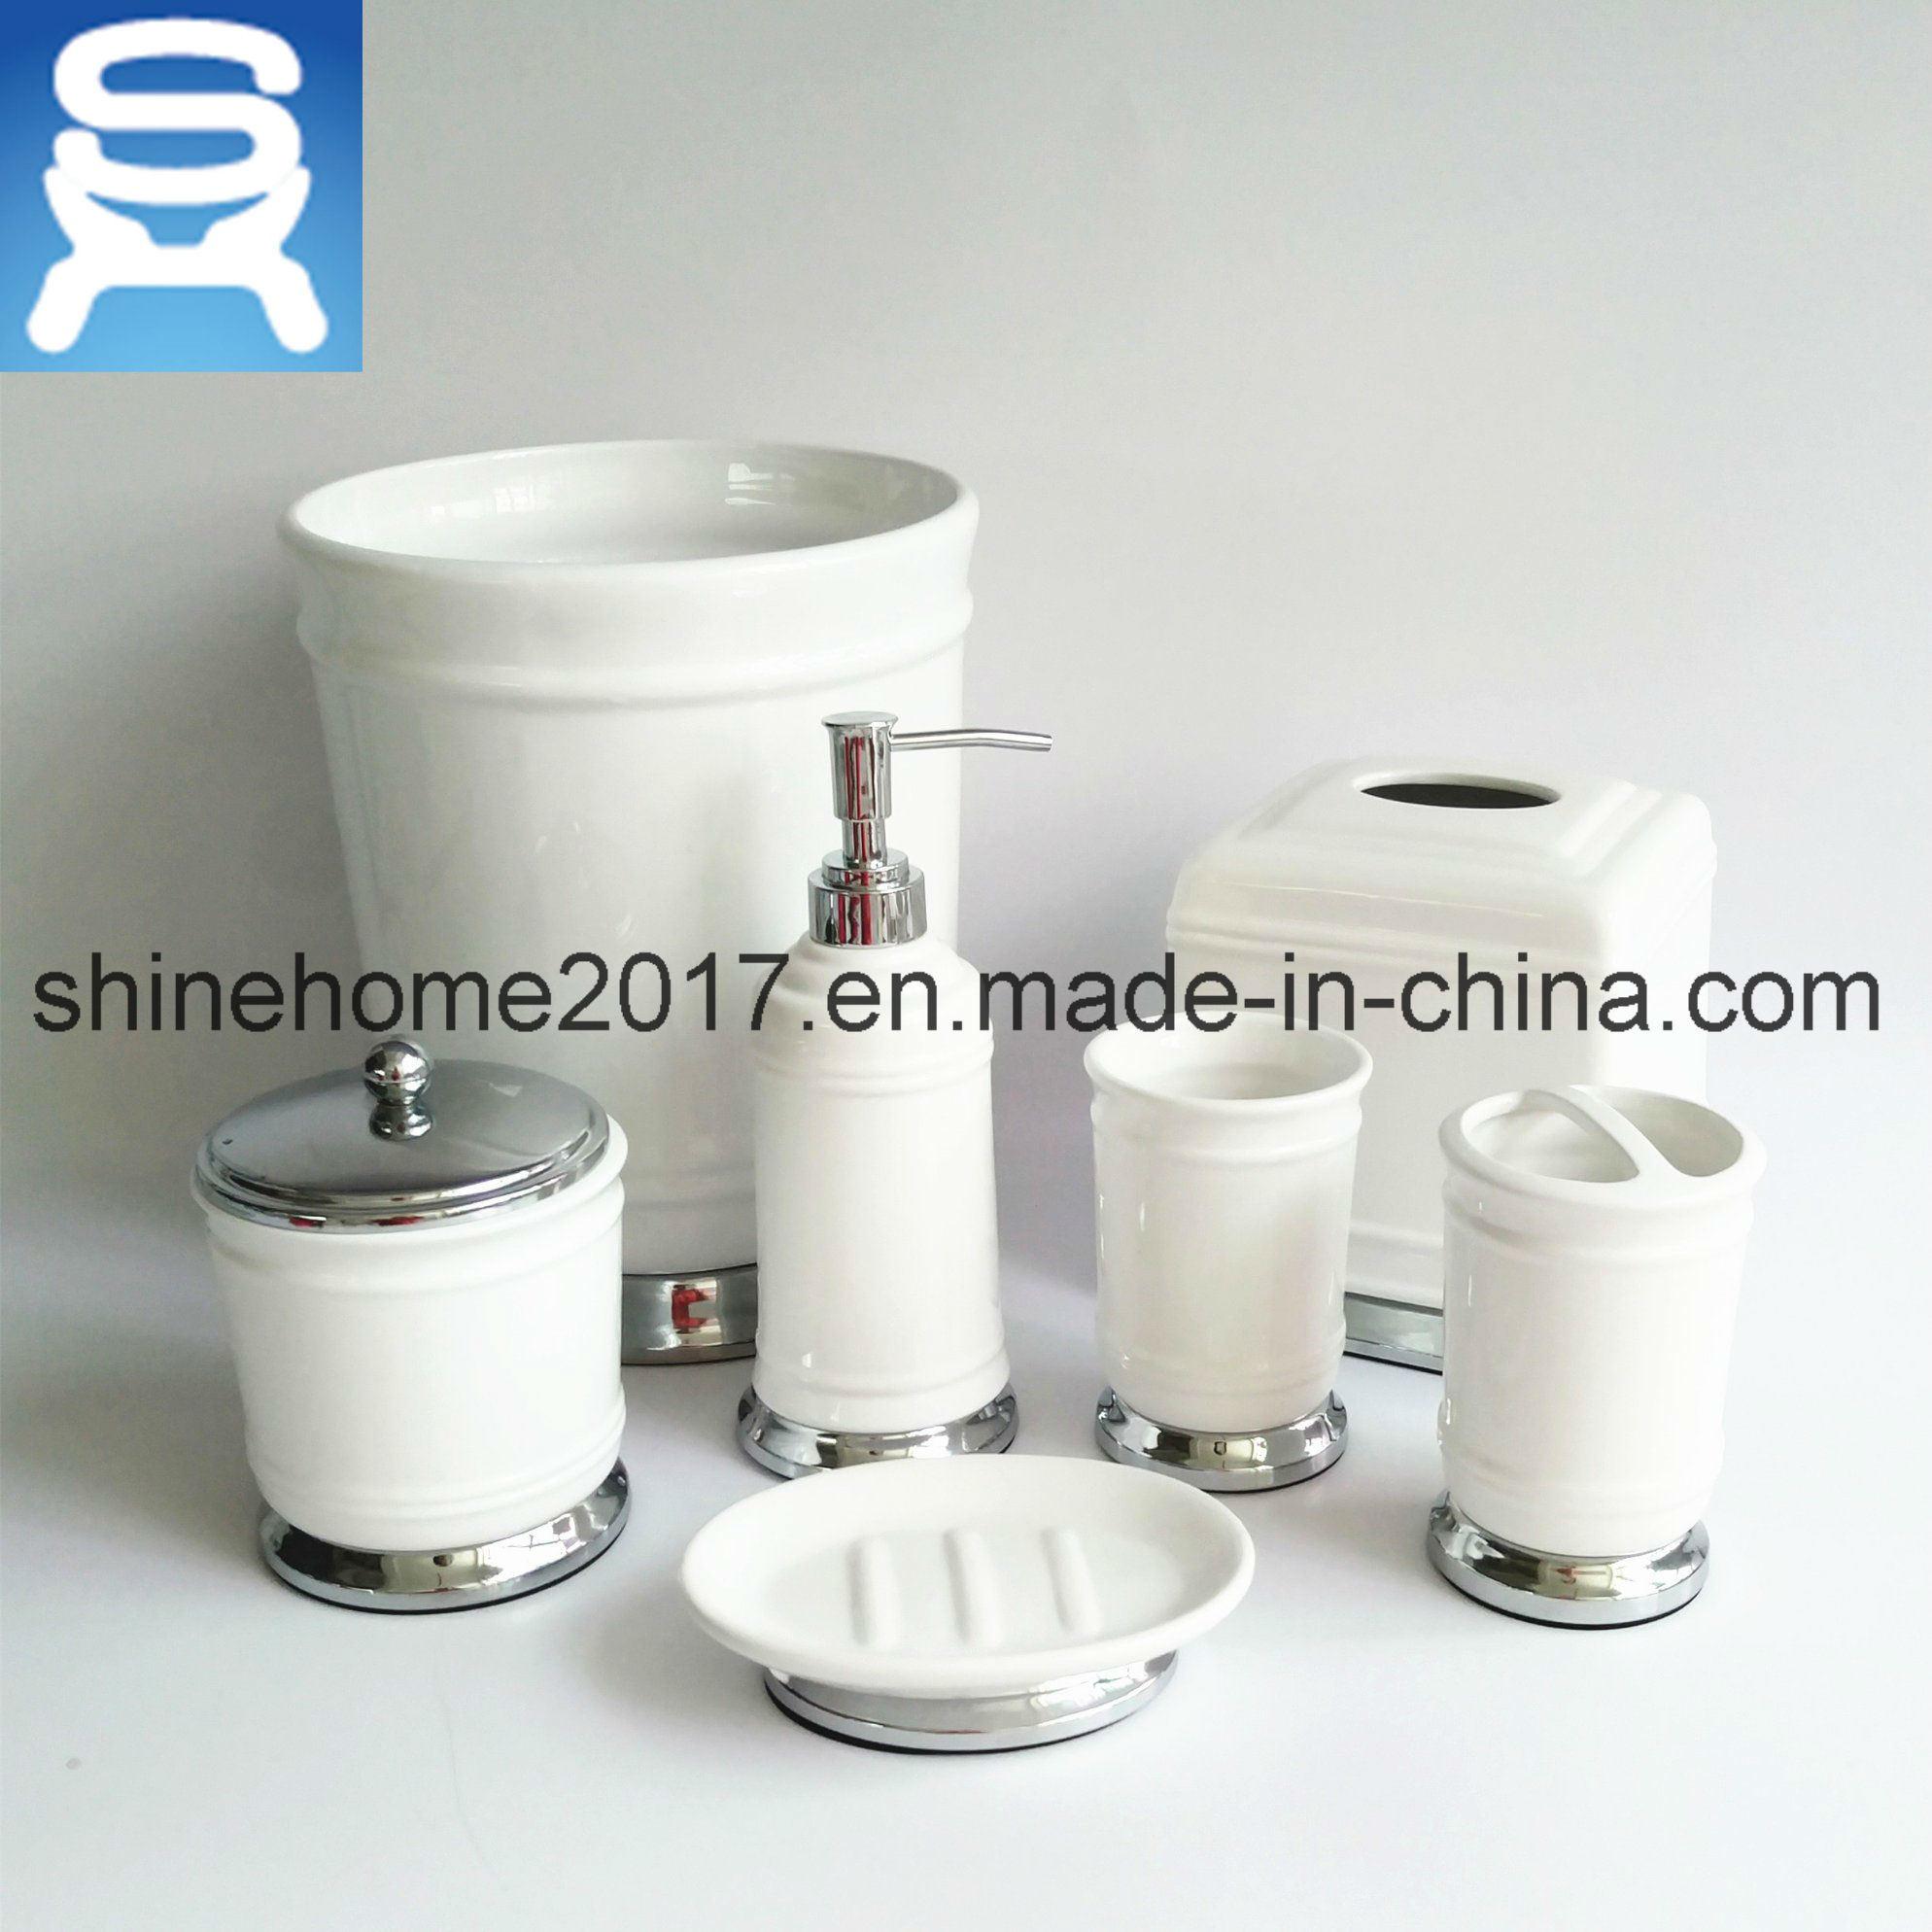 Chrome Plating and Porcelain Bathroom Set/Bathroom Accessories/Bathroom Accessory